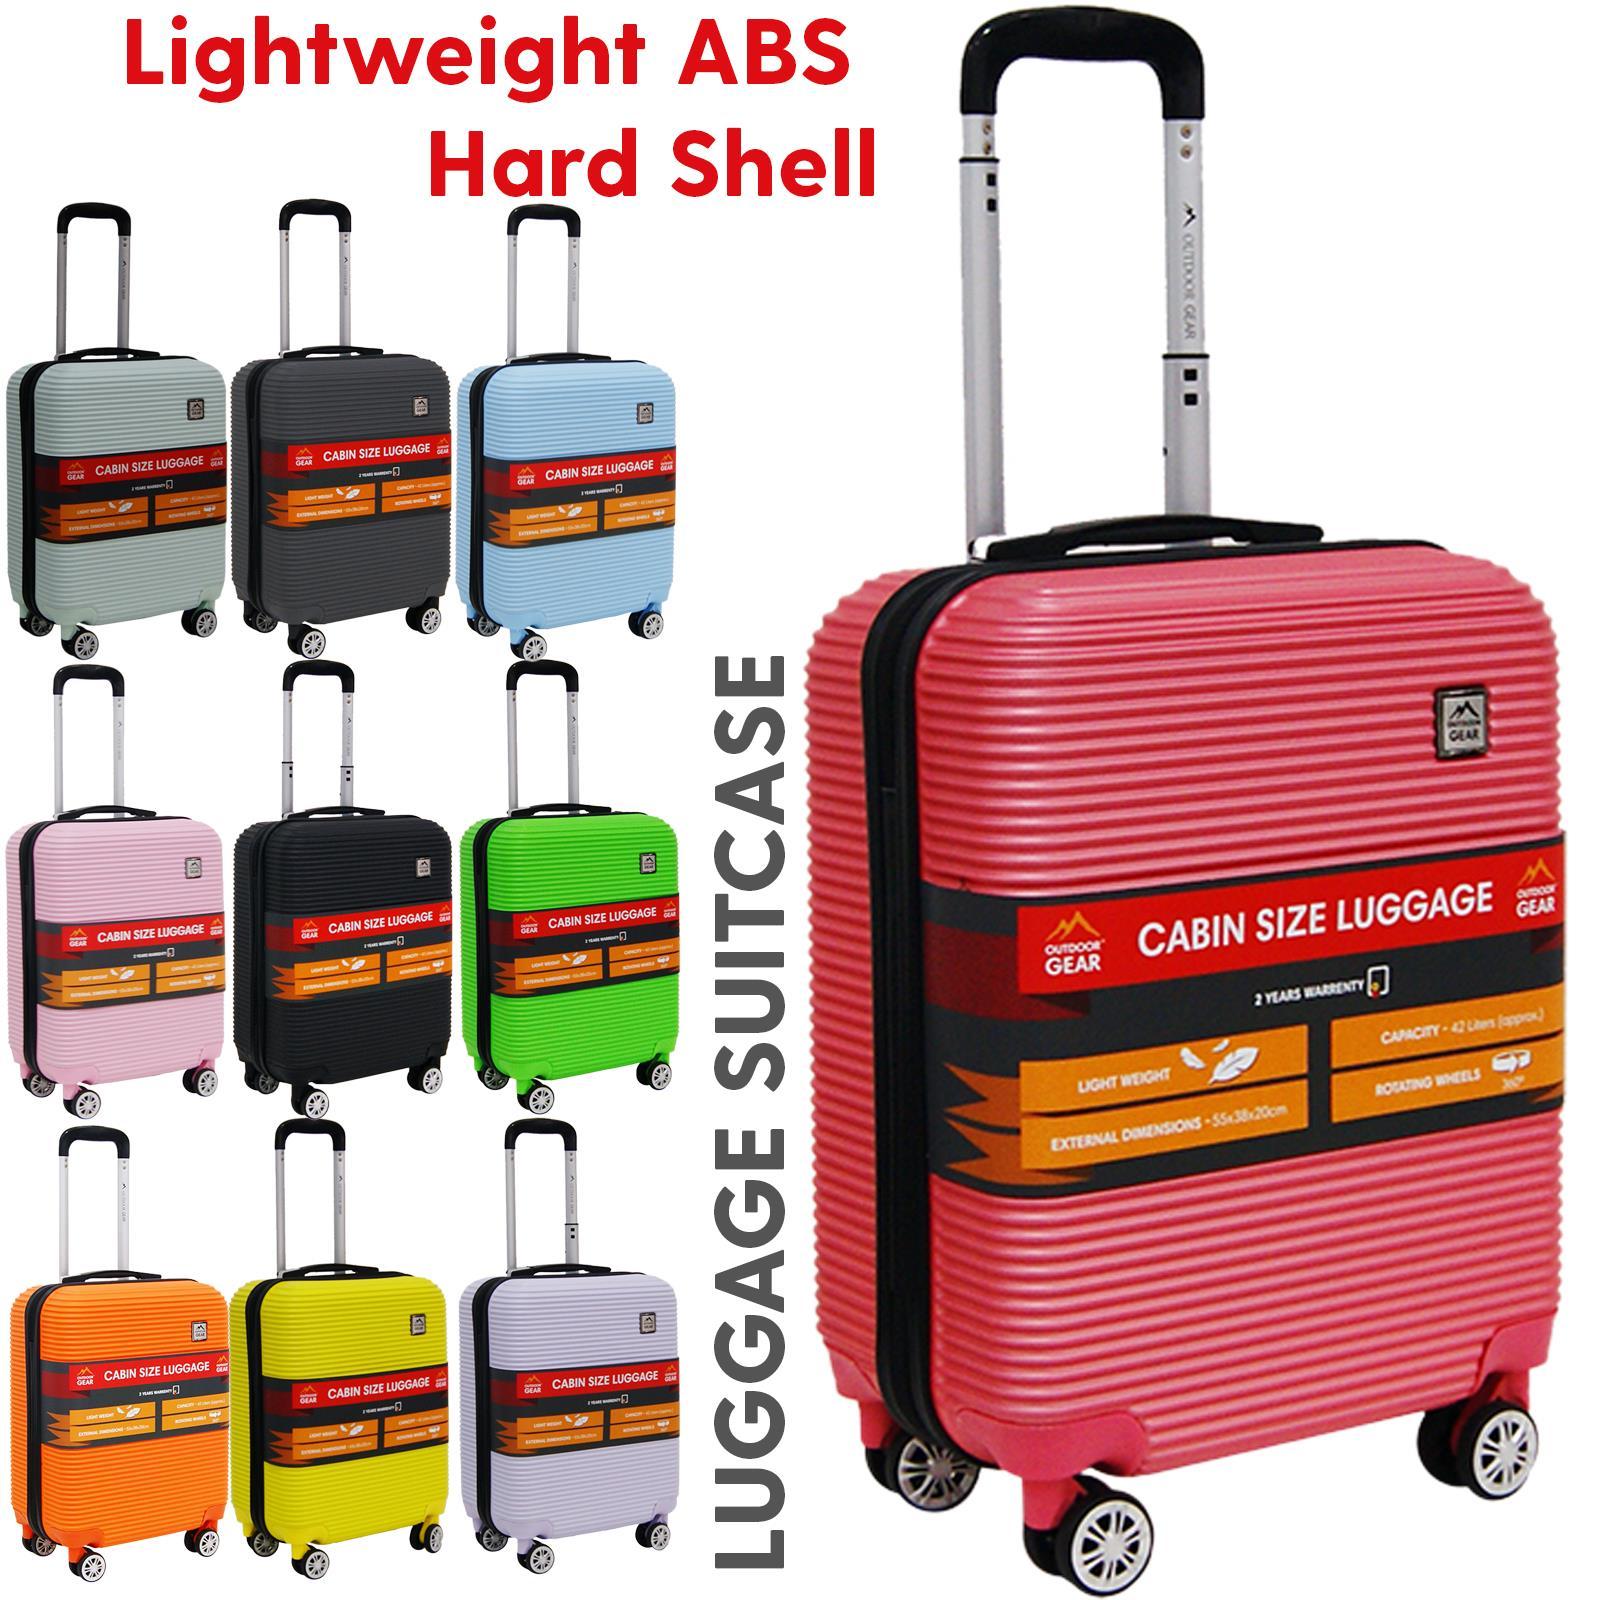 Lightweight 4 Wheel Hardshell Spinner Cabin Luggage Trolley Suitcase Travel Bag